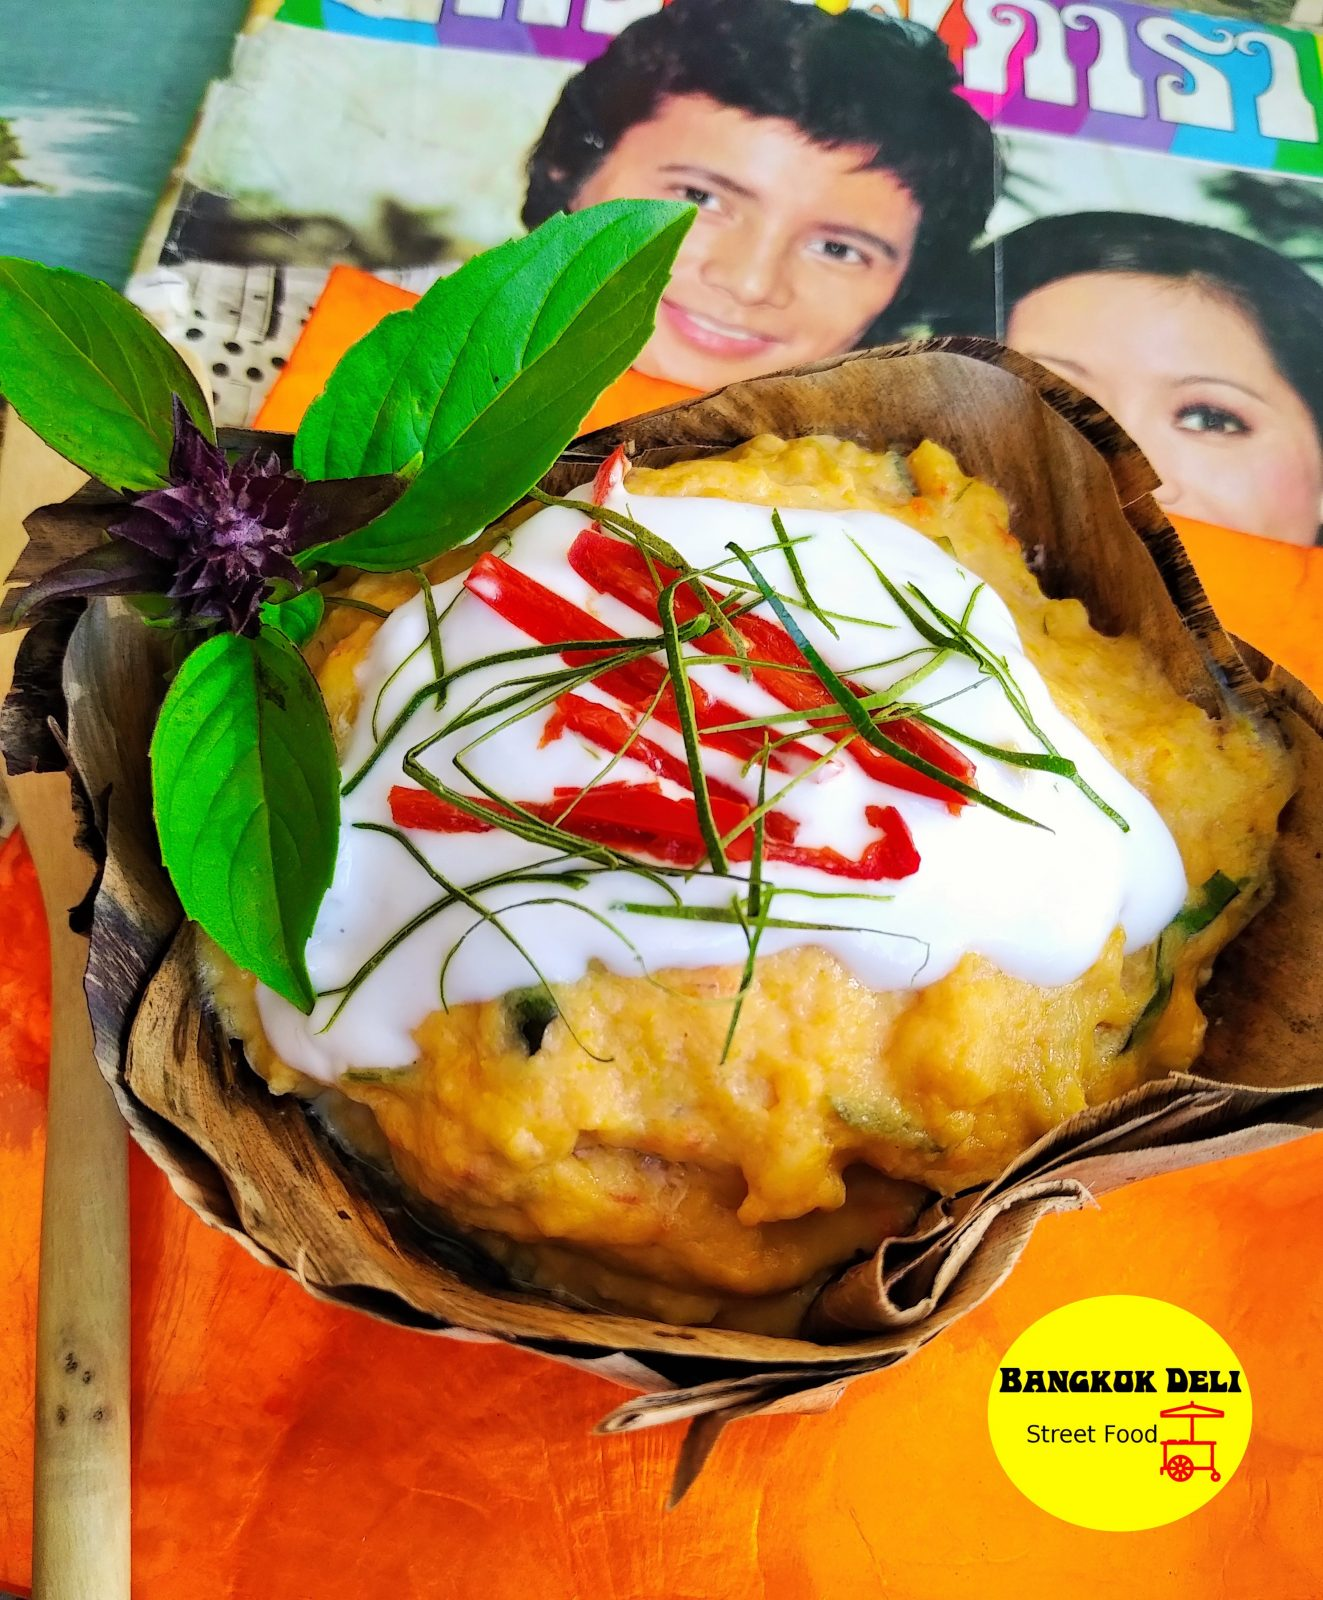 Bangkok Deli – street food